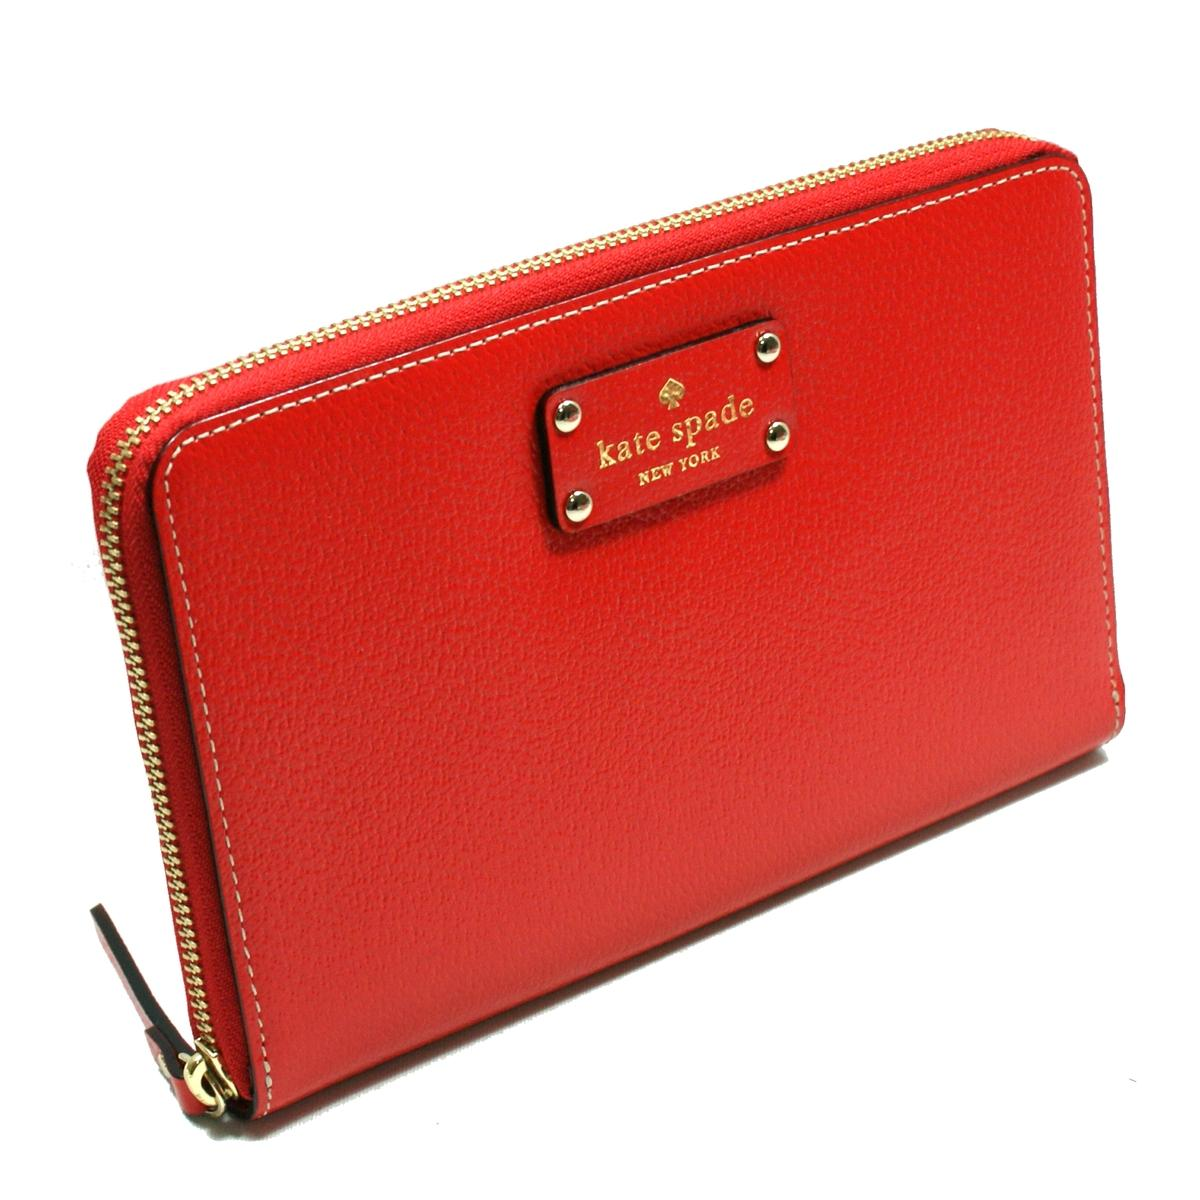 Kate Spade Wellesley Red Garnet Zip Travel Wallet Clutch